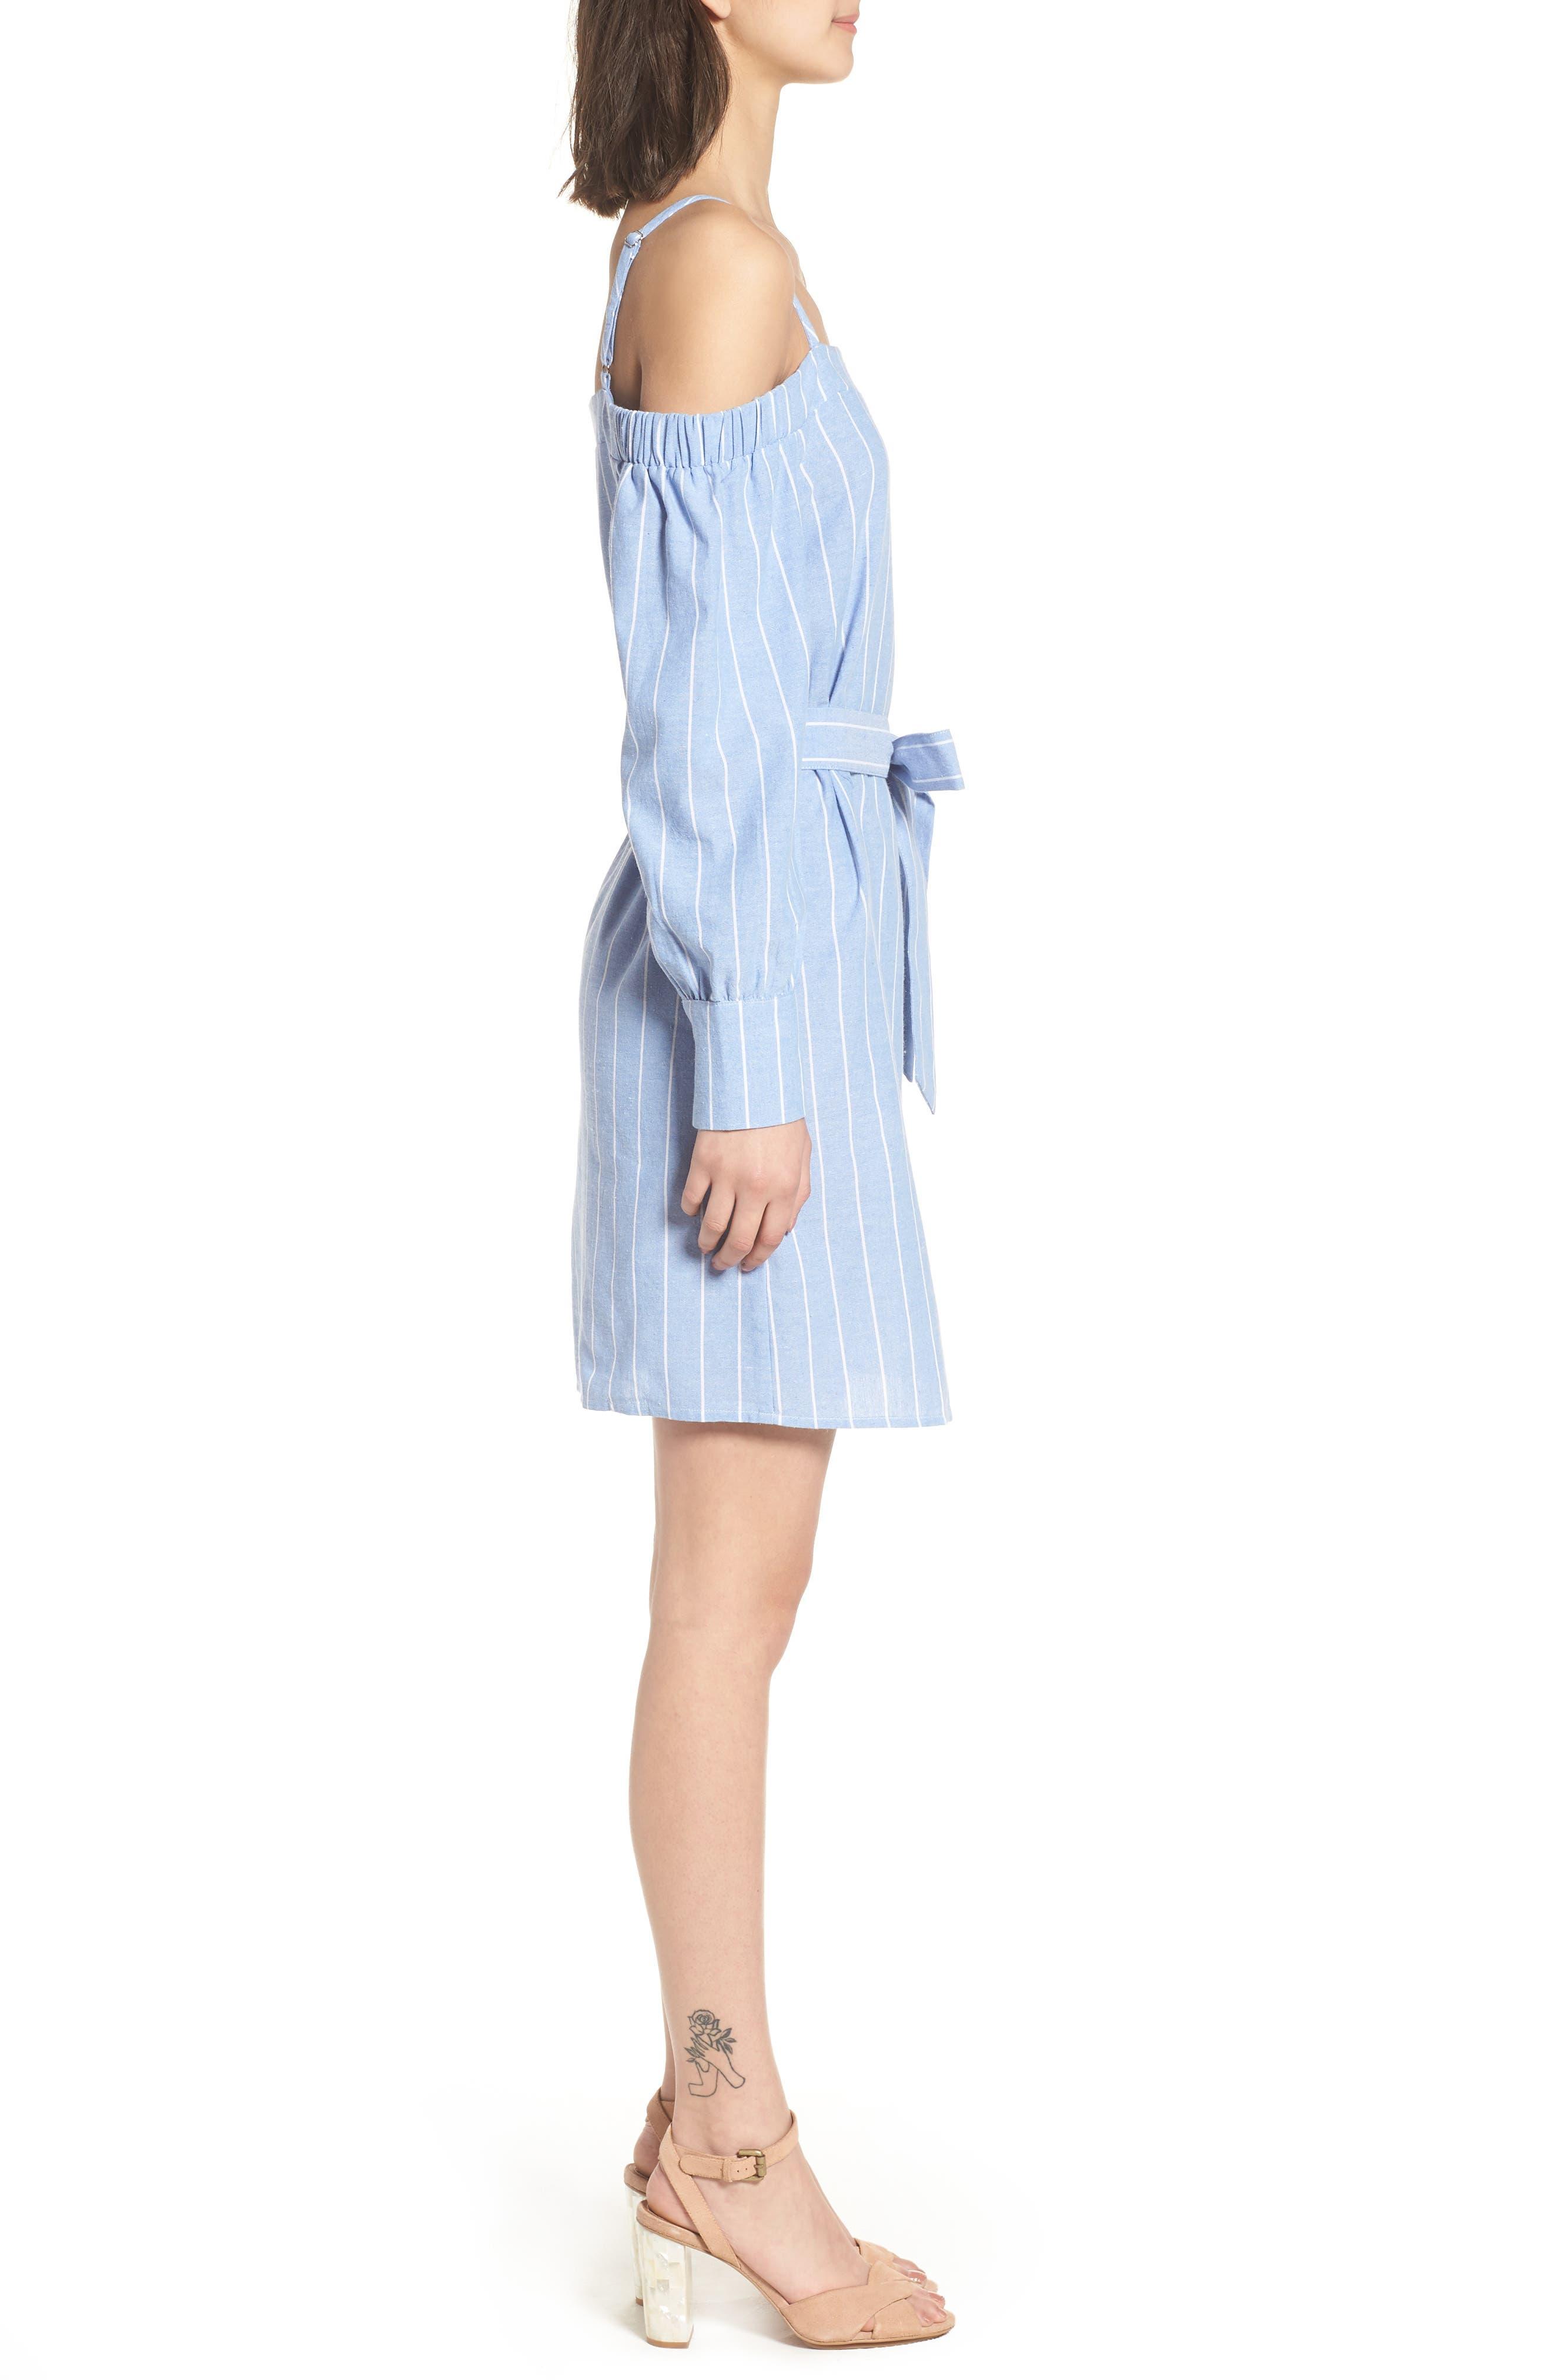 Bishop + Young Chrissy Cold Shoulder Dress,                             Alternate thumbnail 3, color,                             Blue White Stripe